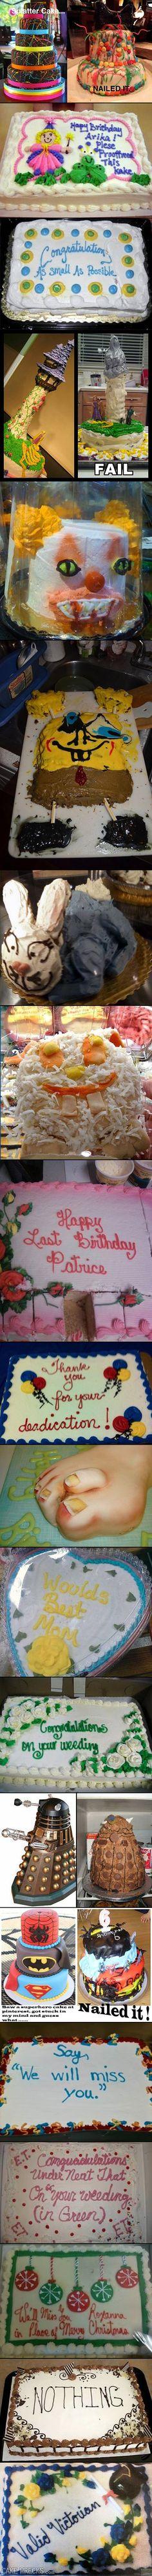 Epic cake fails. Rotfl